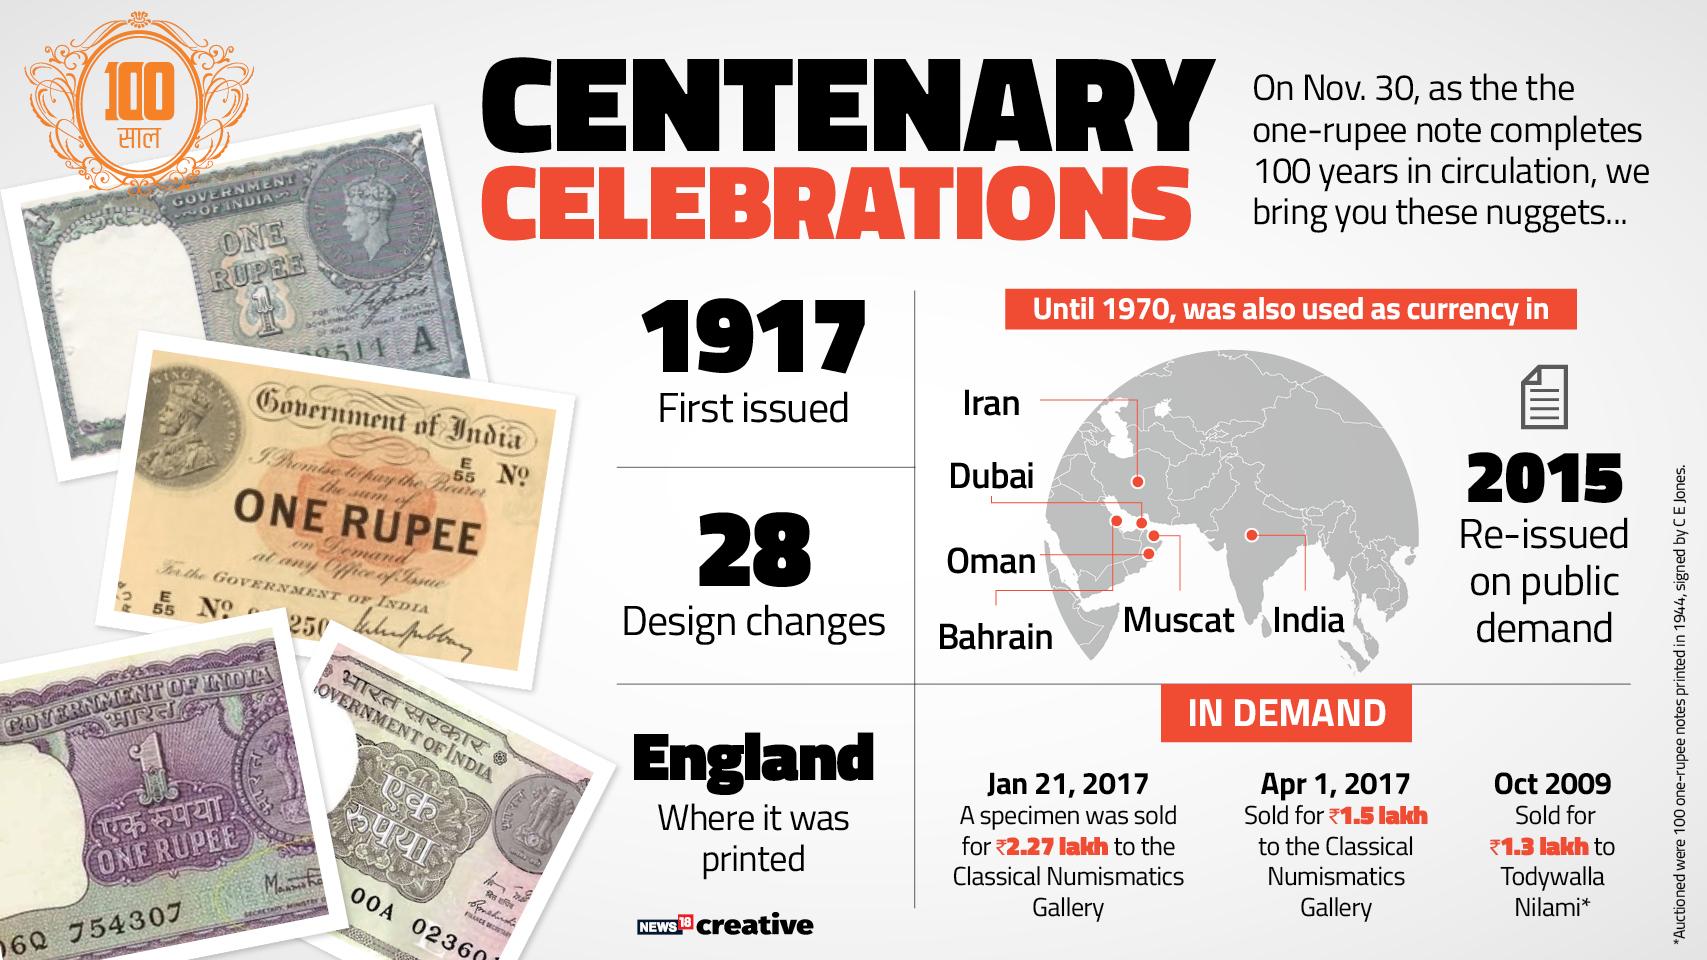 One rupee Note 100 years